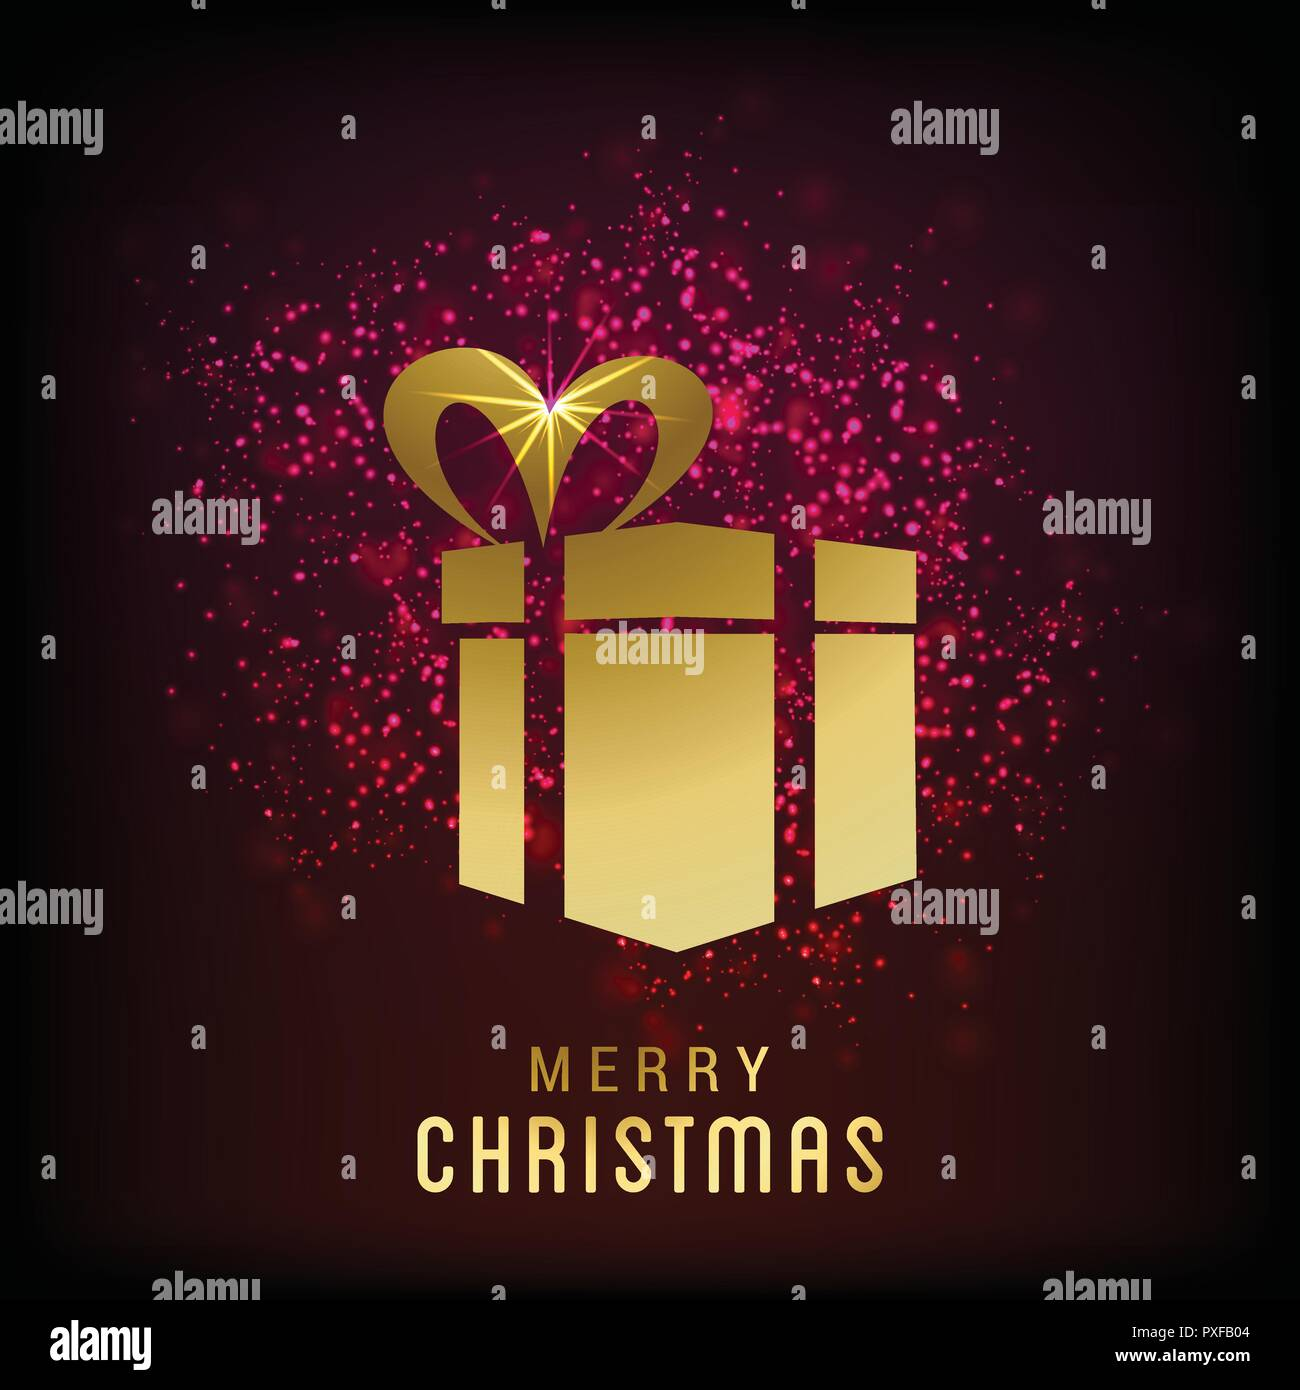 Merry Christmas cards with creative design vector Stock Vector Art ...